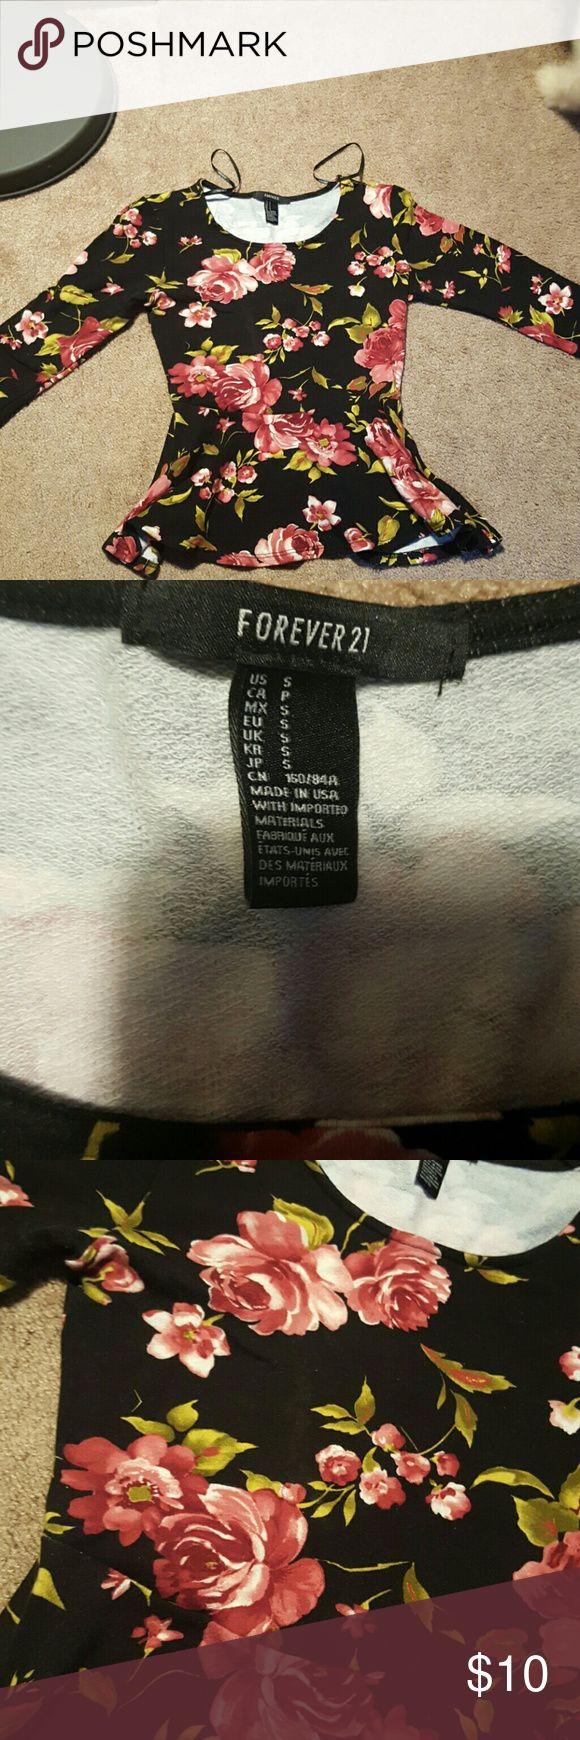 black and floral peplum top Super flattering black and floral peplum top. Forever 21 Tops Tees - Long Sleeve